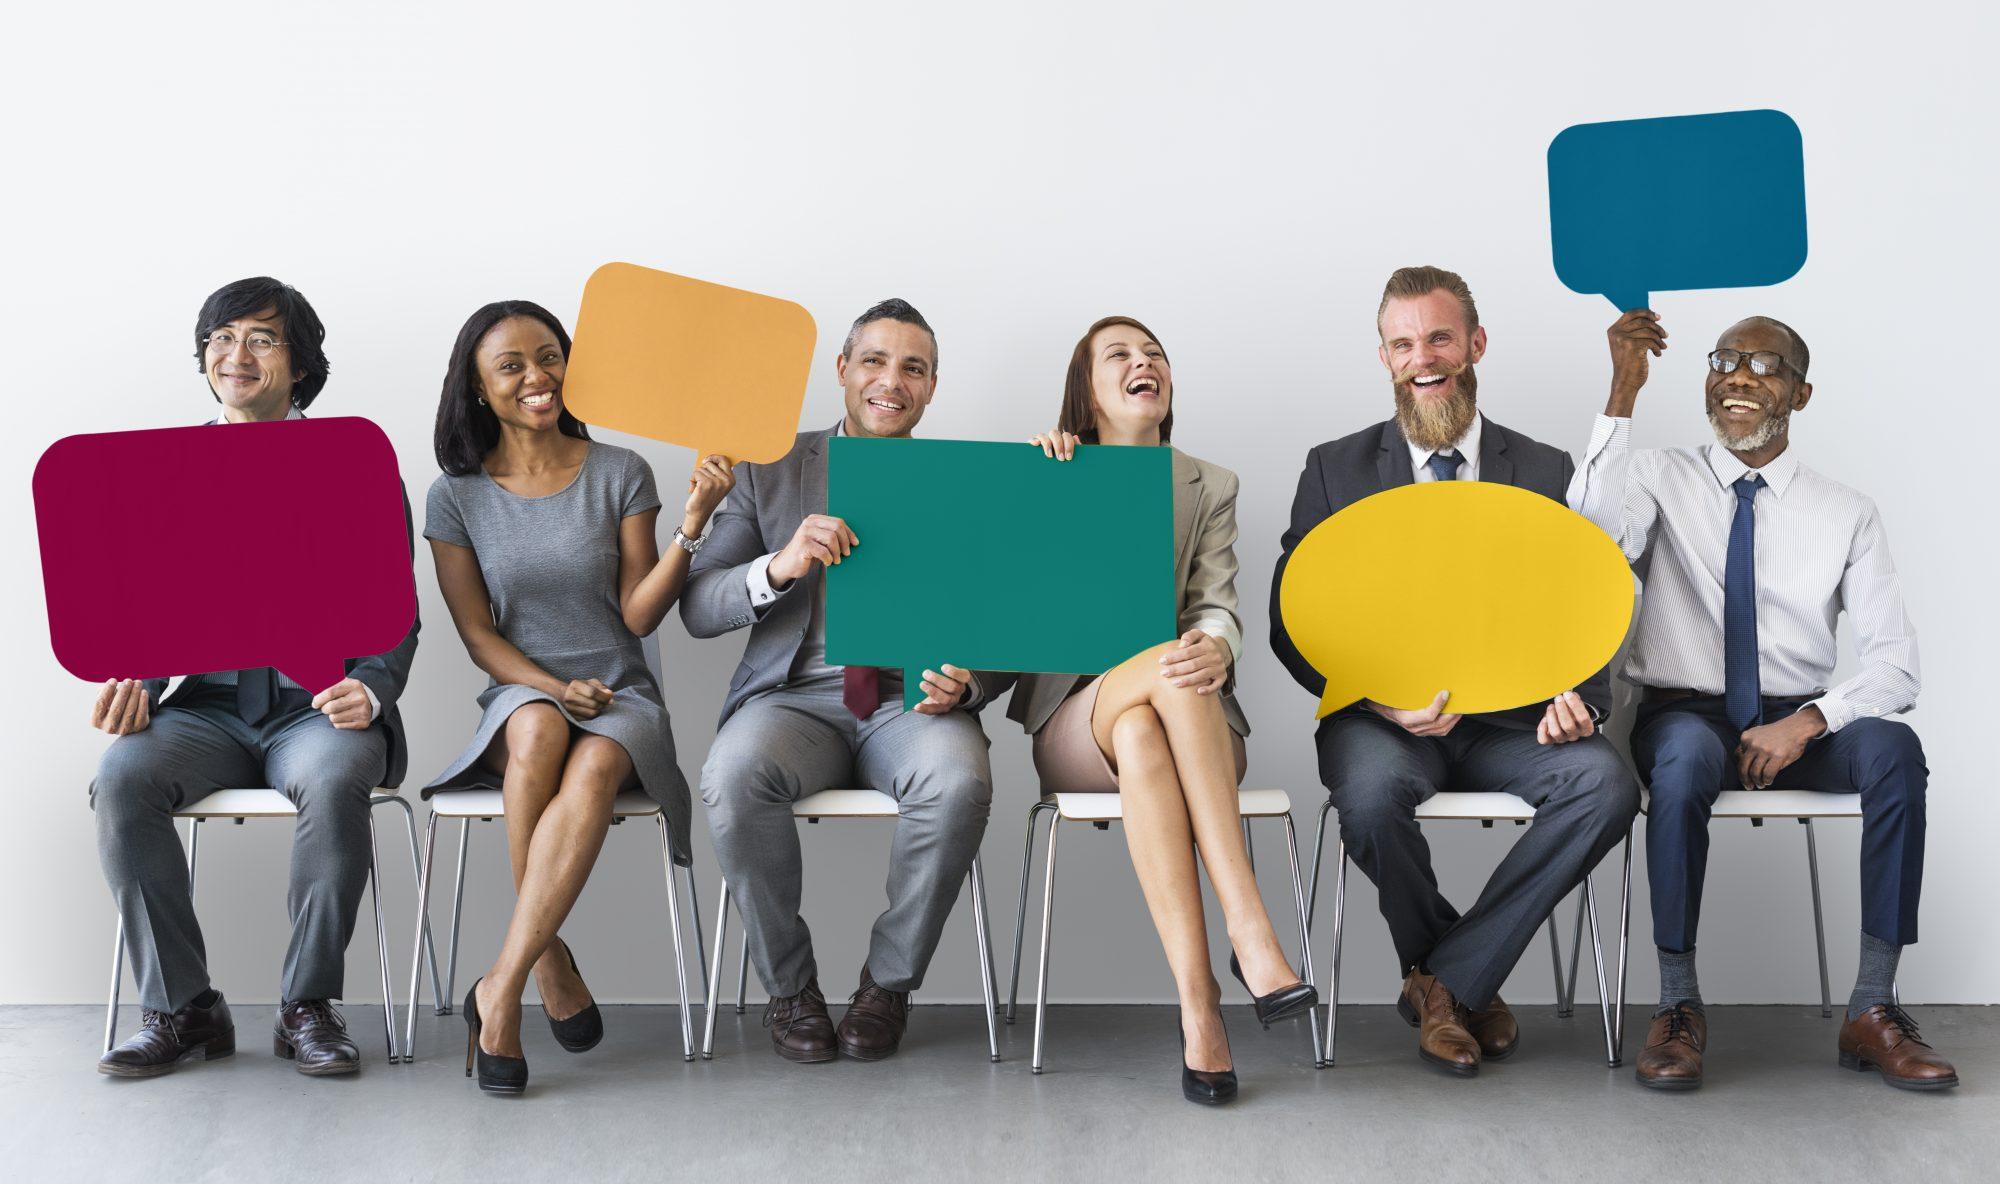 Van-Westendorp-Analyse Personen kommunizieren RogPanel